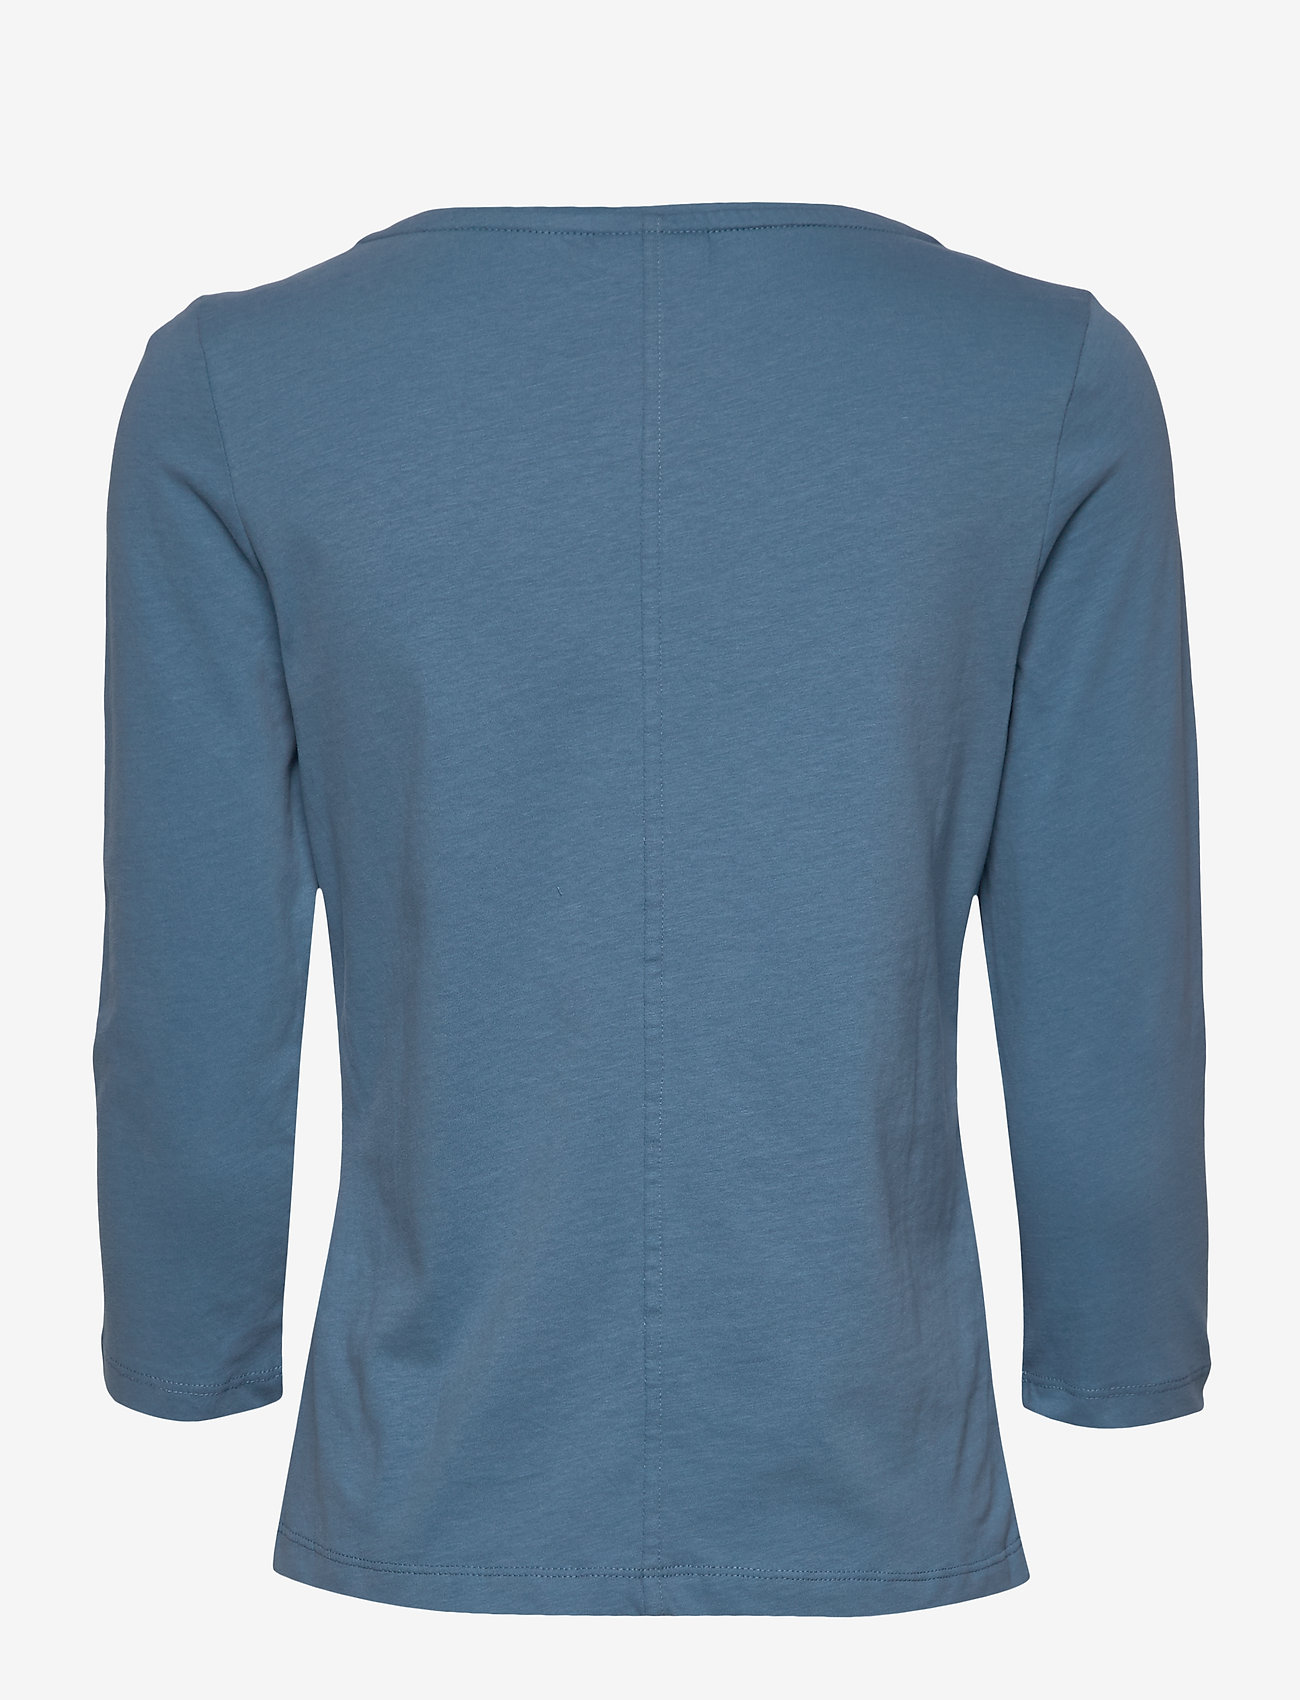 3/4 Sleeve Boat Neck (Blue Heaven) (315 kr) - Calvin Klein